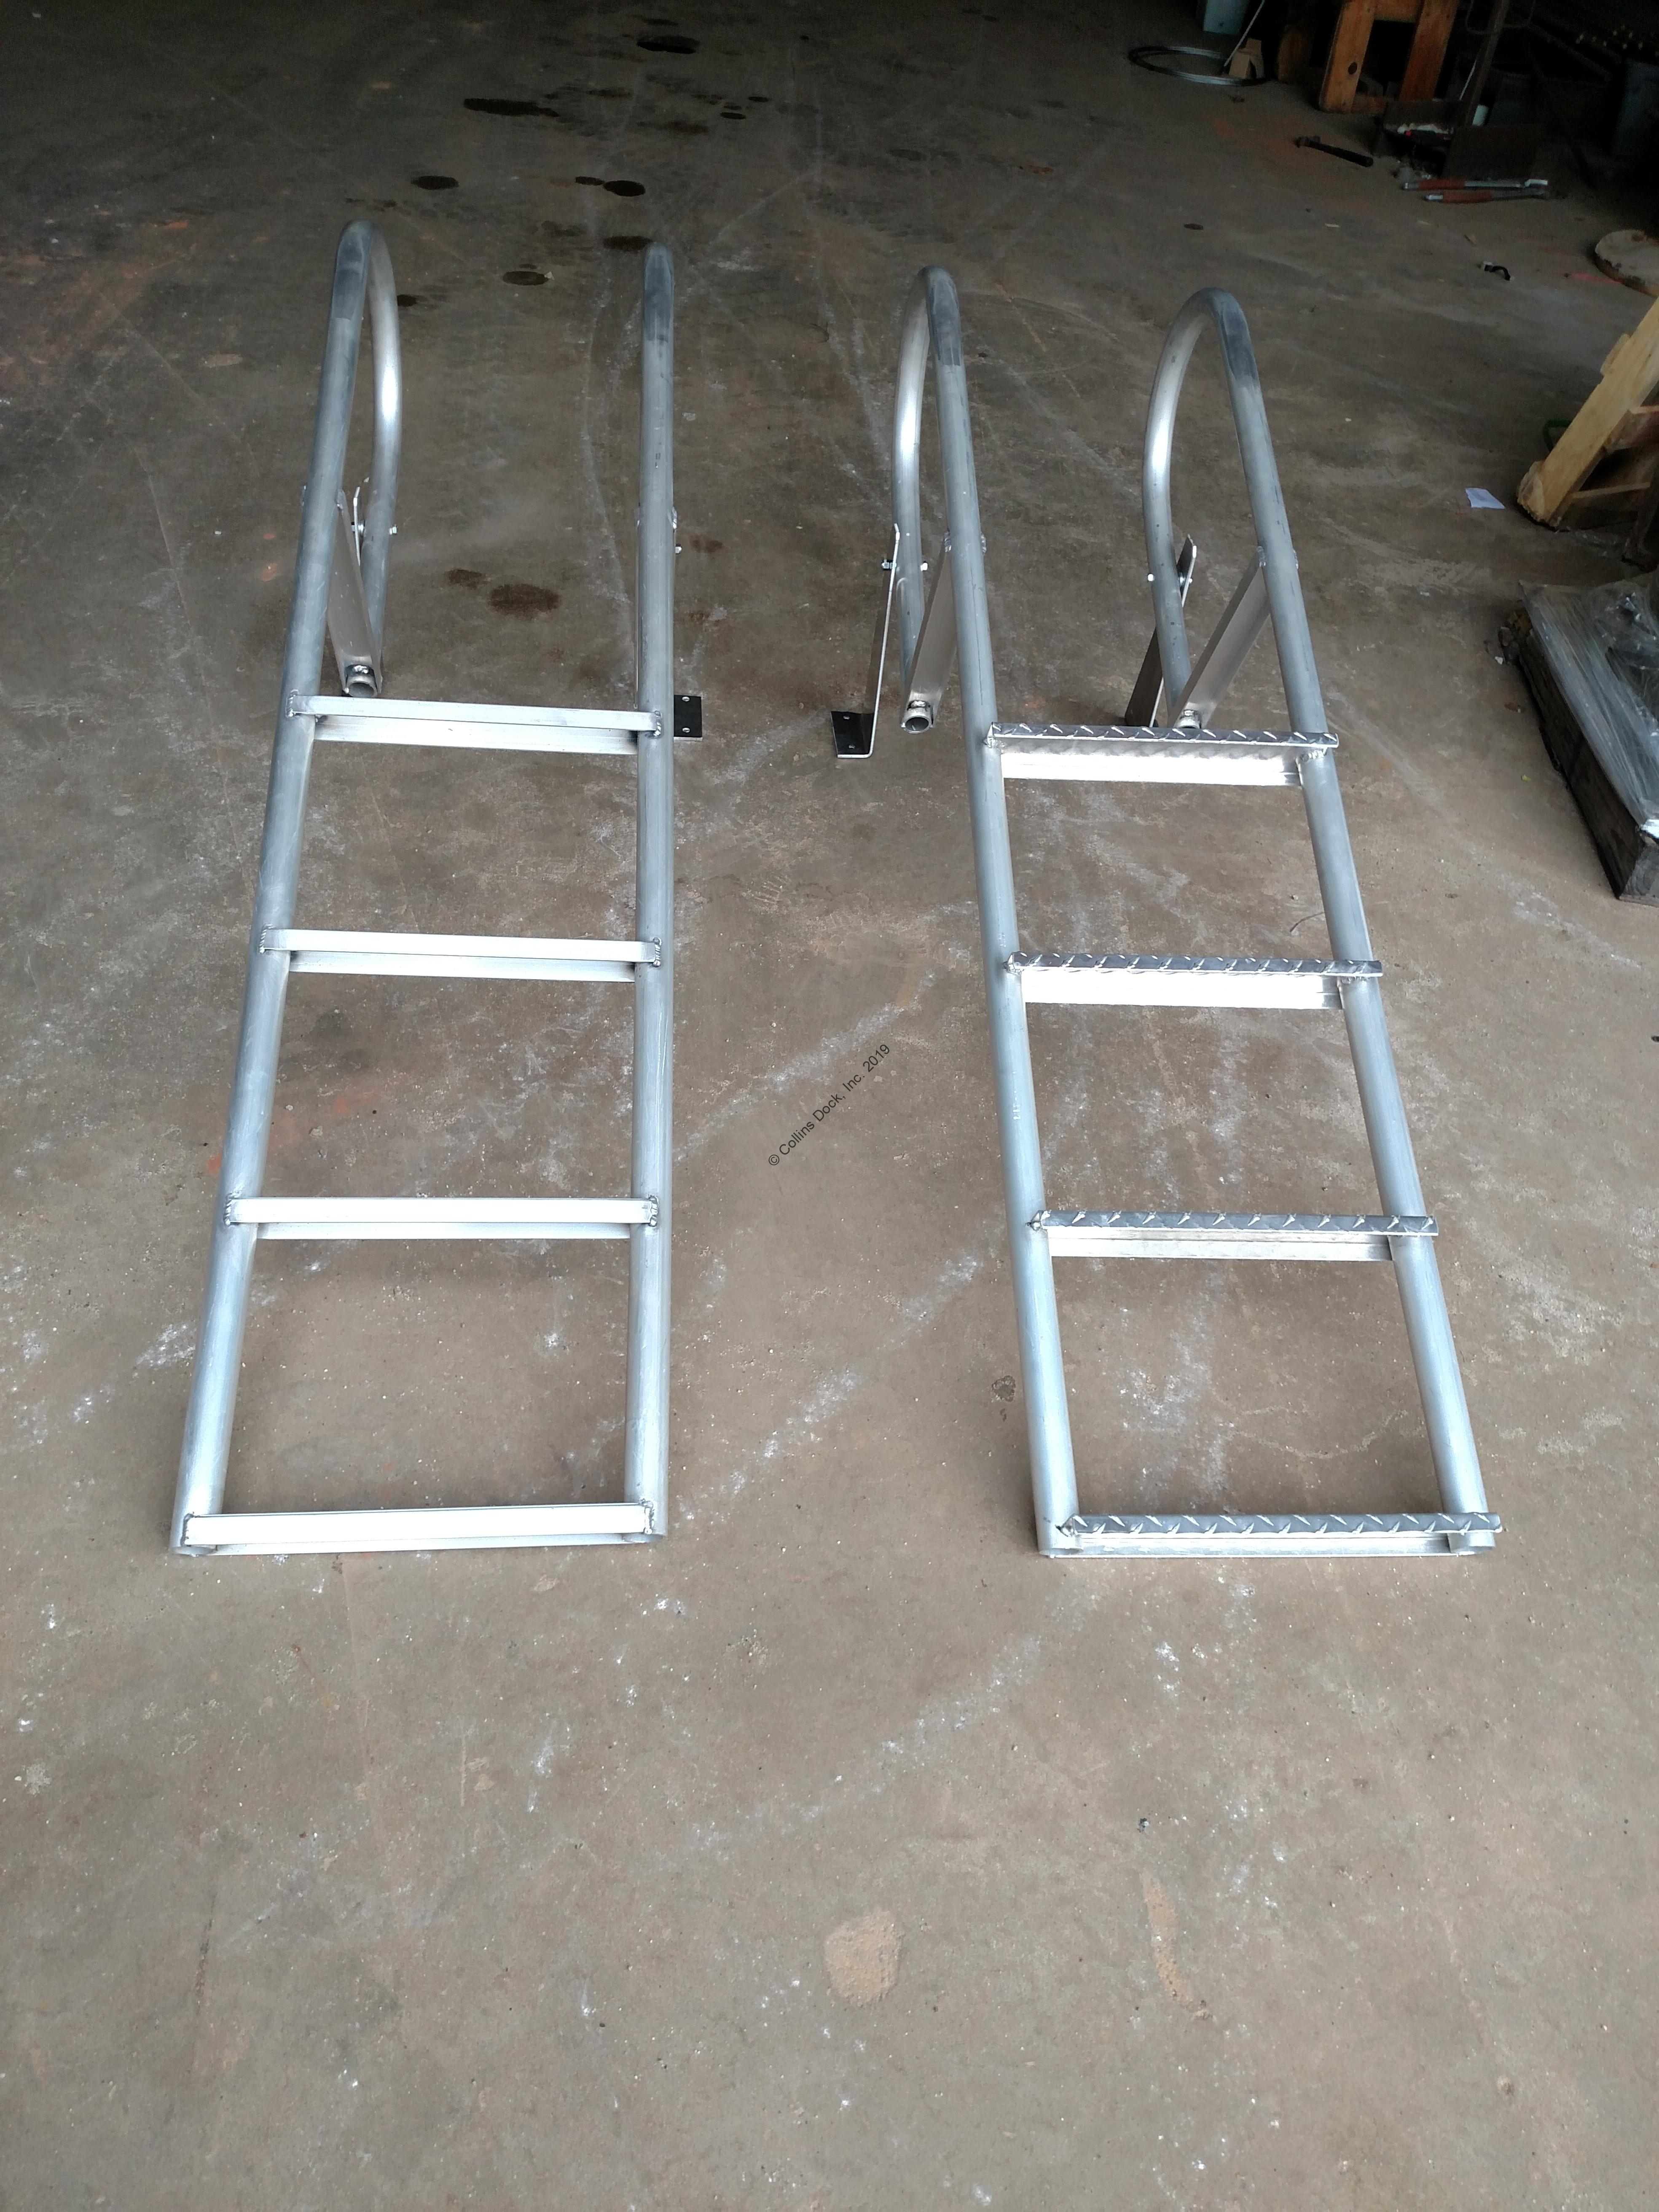 laddertypes